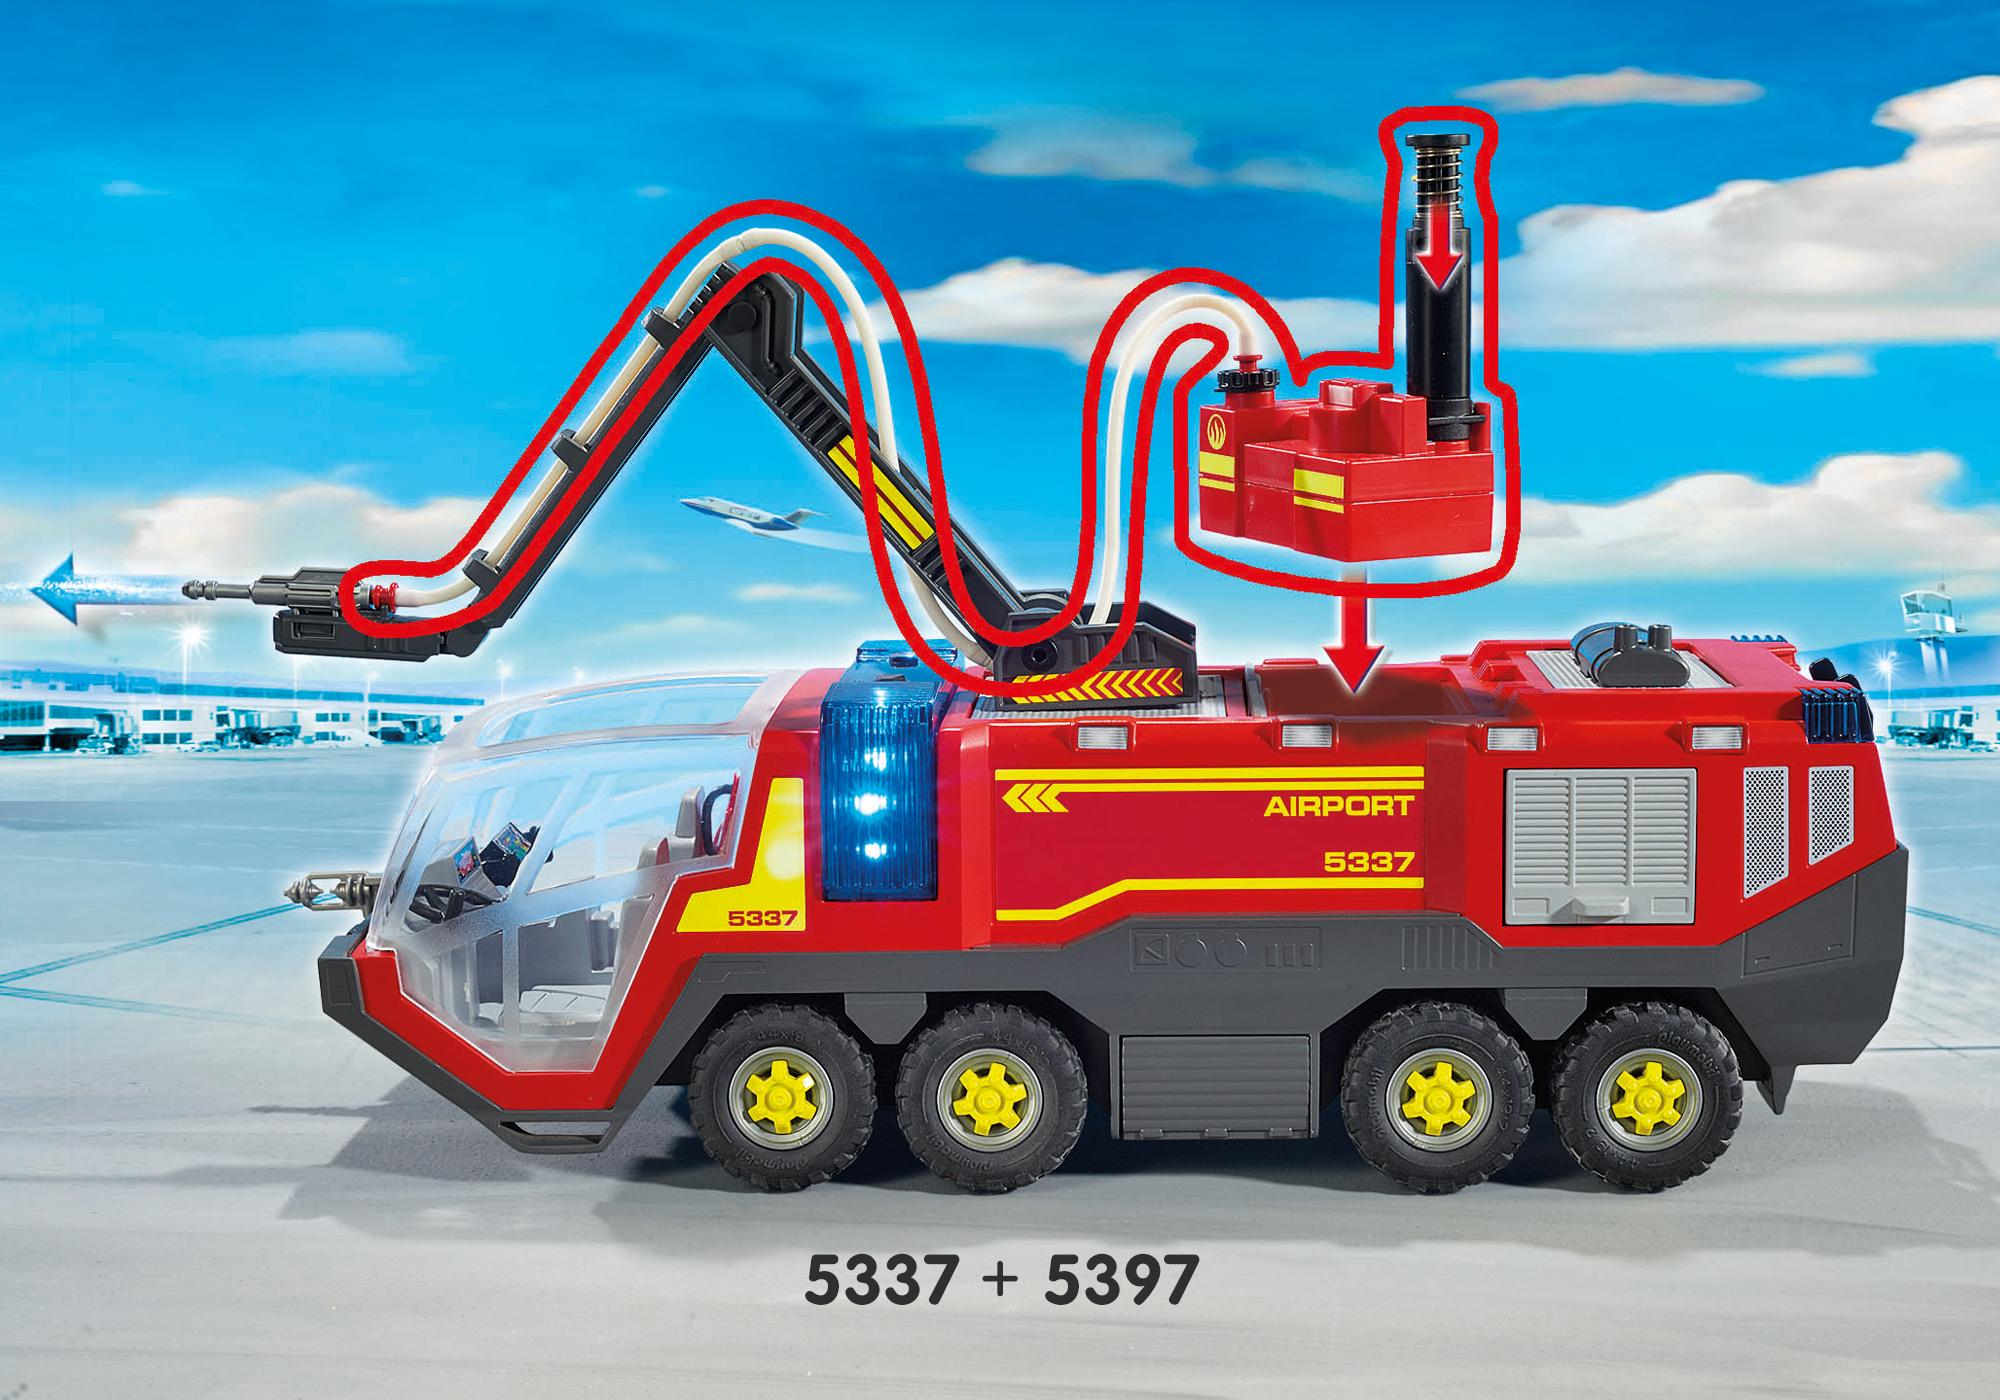 http://media.playmobil.com/i/playmobil/5337_product_extra5/Mezzo antincendio dell'aeroporto